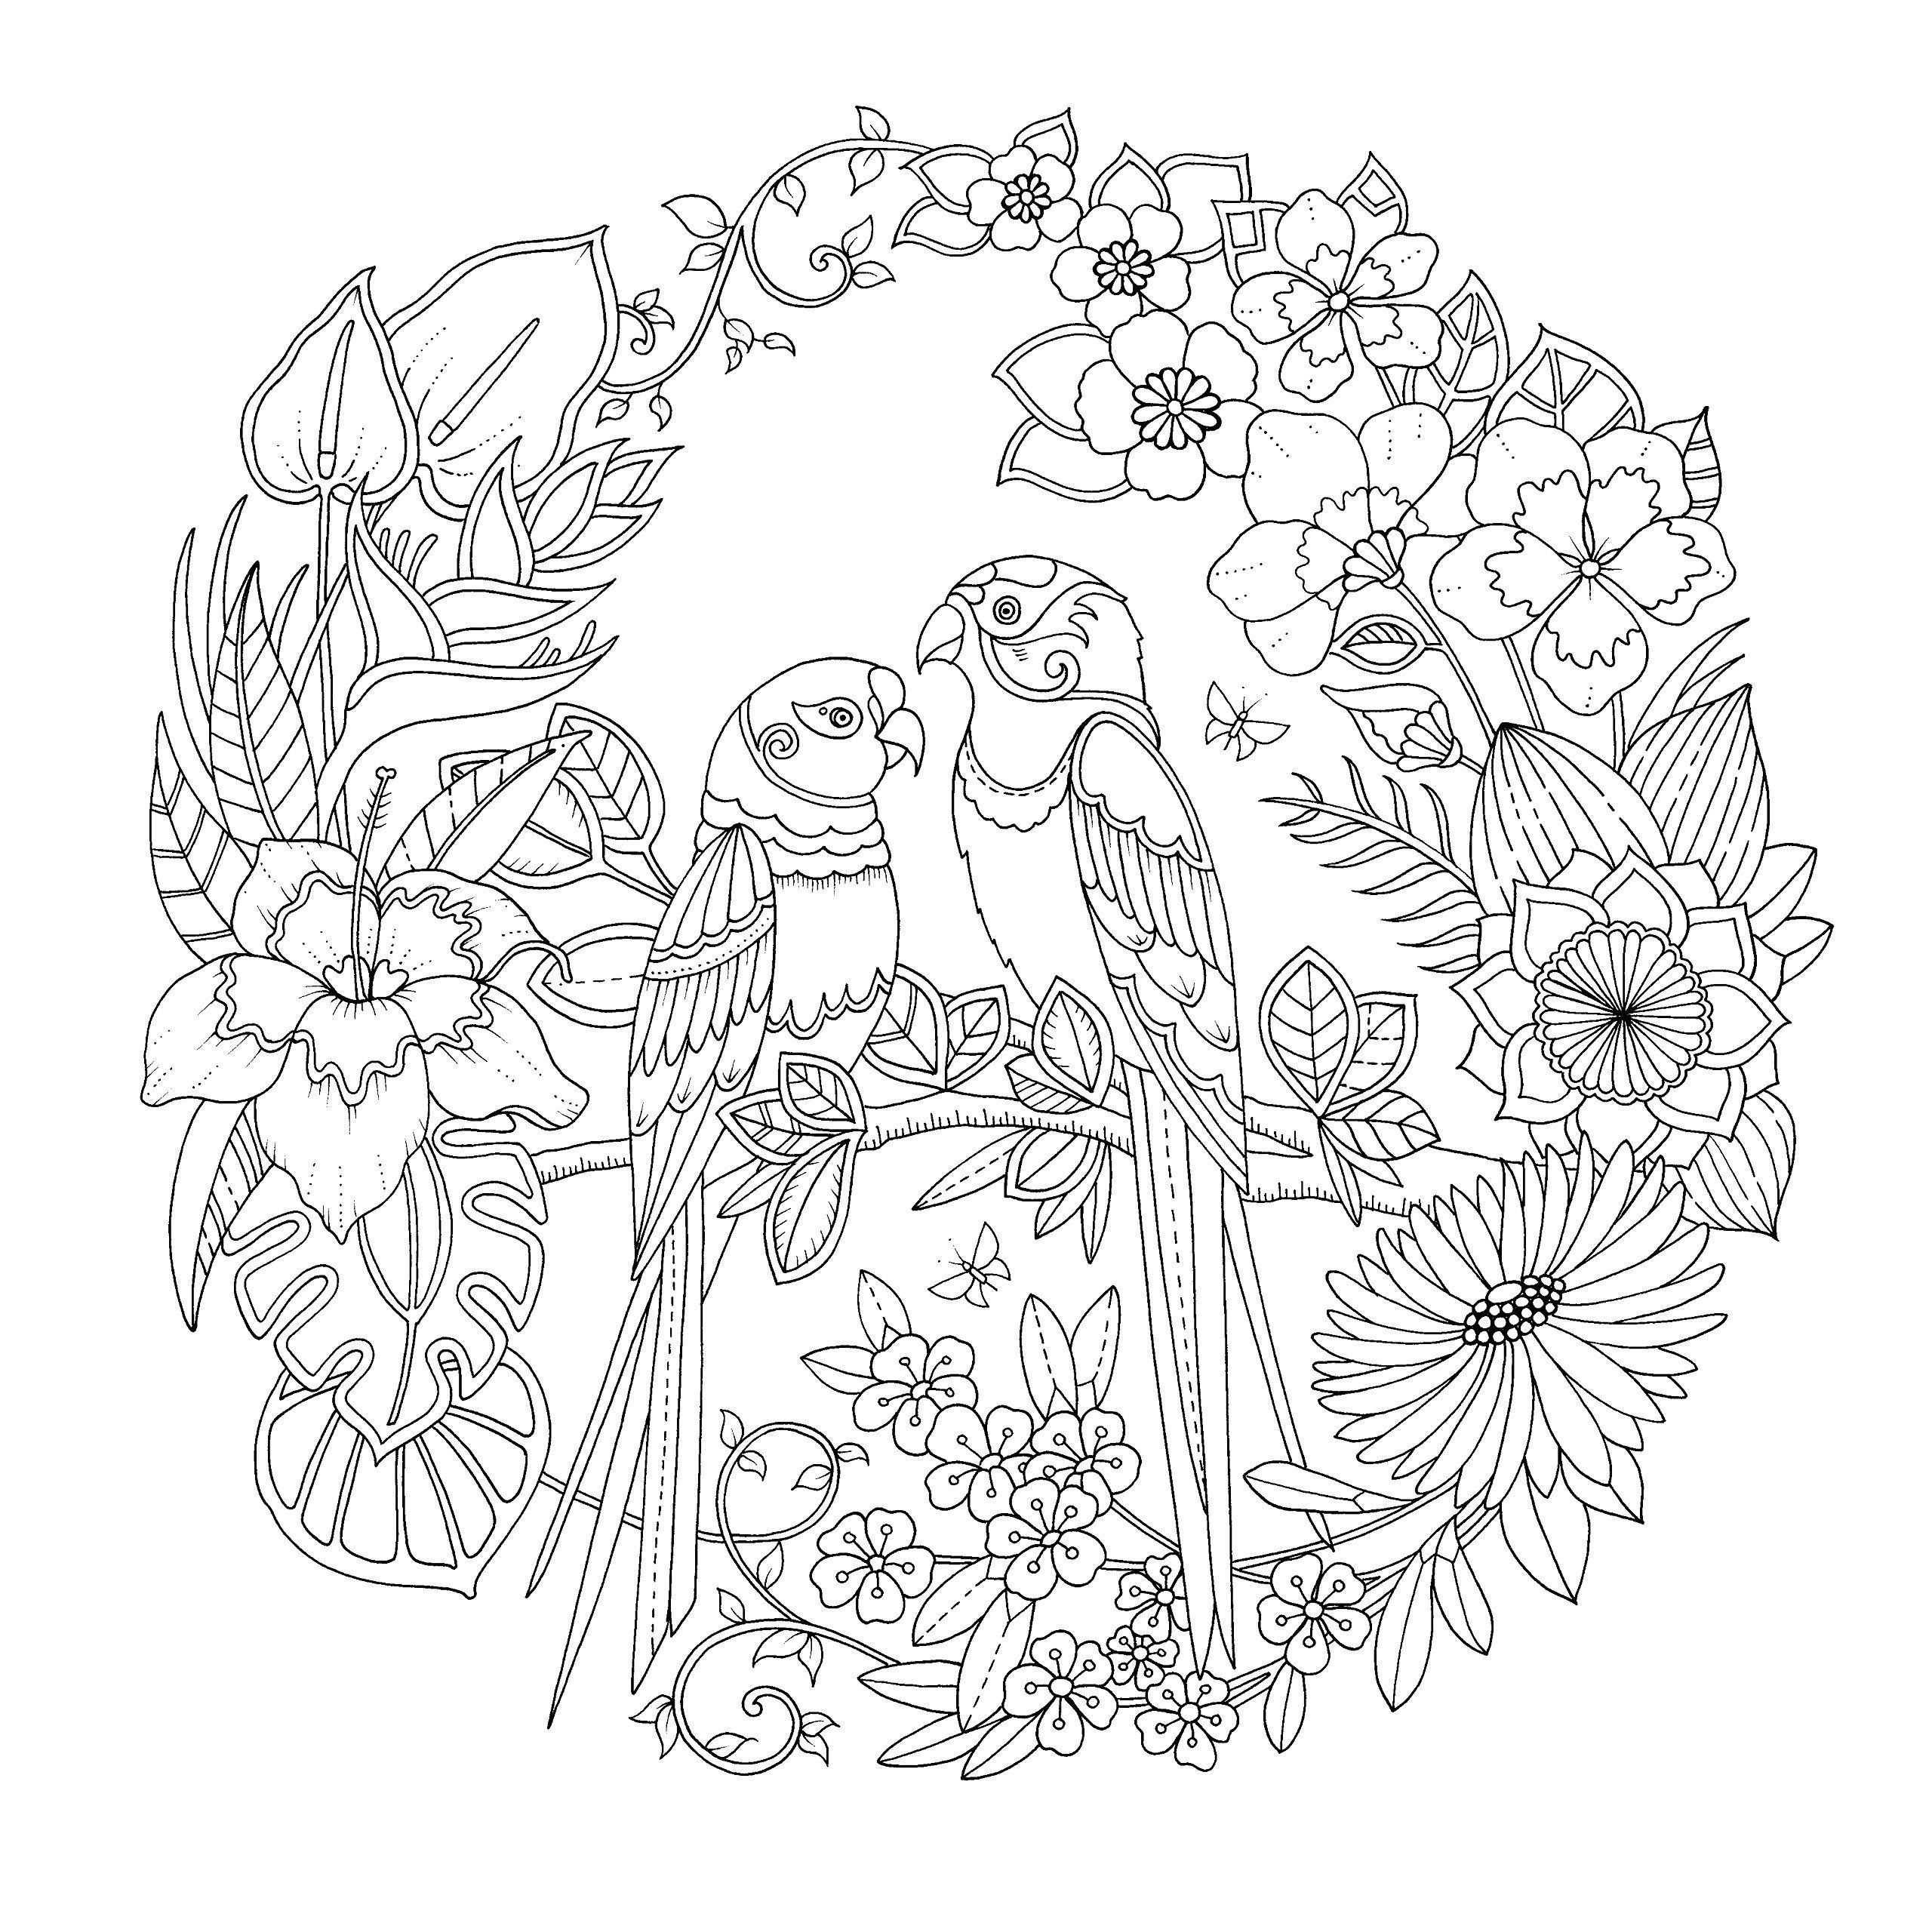 12+ Birds coloring-Ideen  wenn du mal buch, ausmalbilder, ausmalen